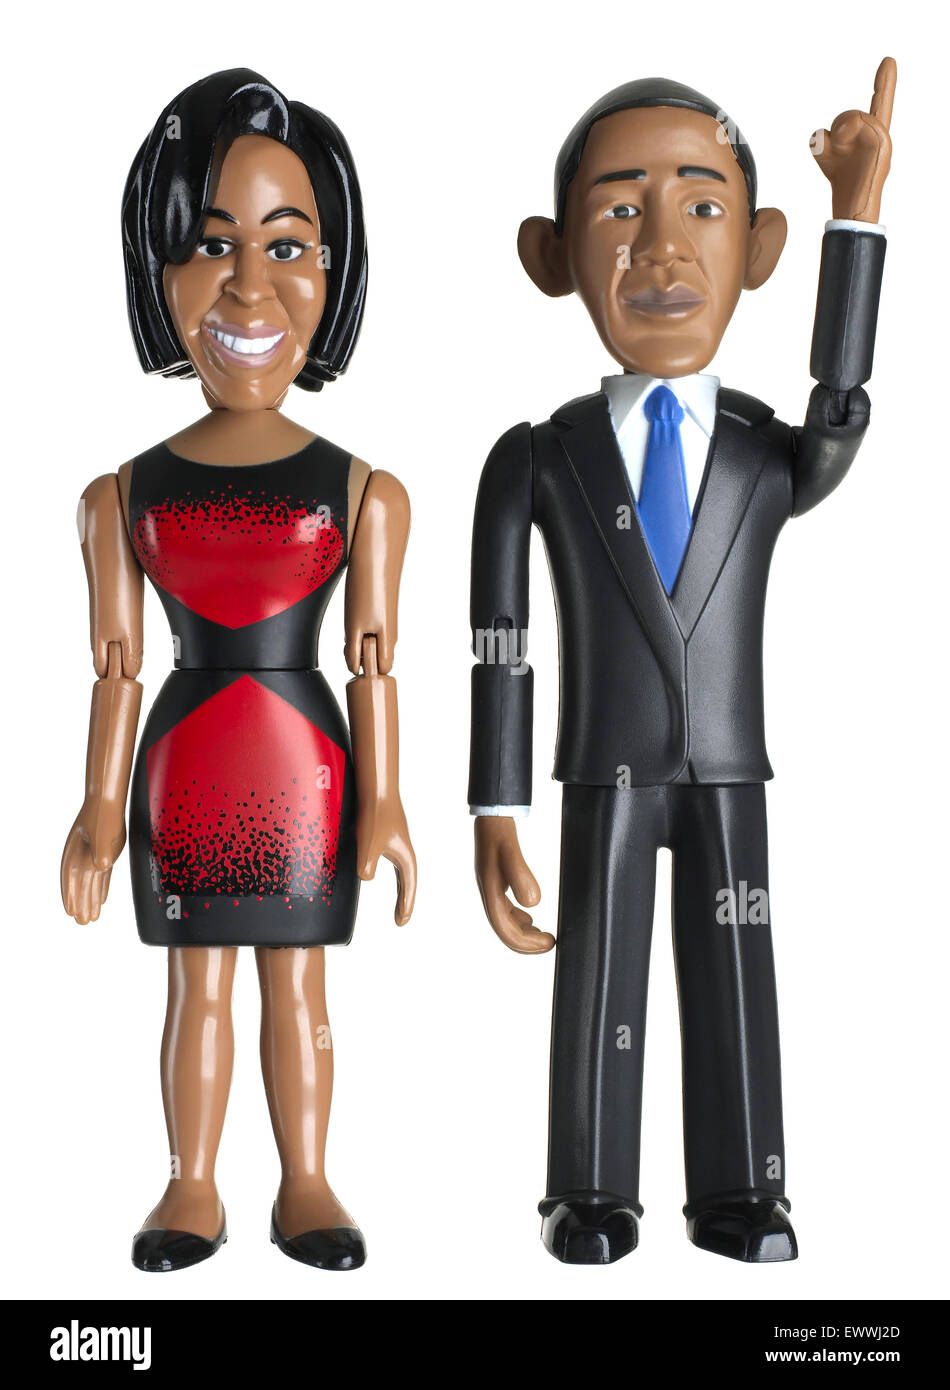 President Barack Obama and Michelle Obama doll - Stock Image